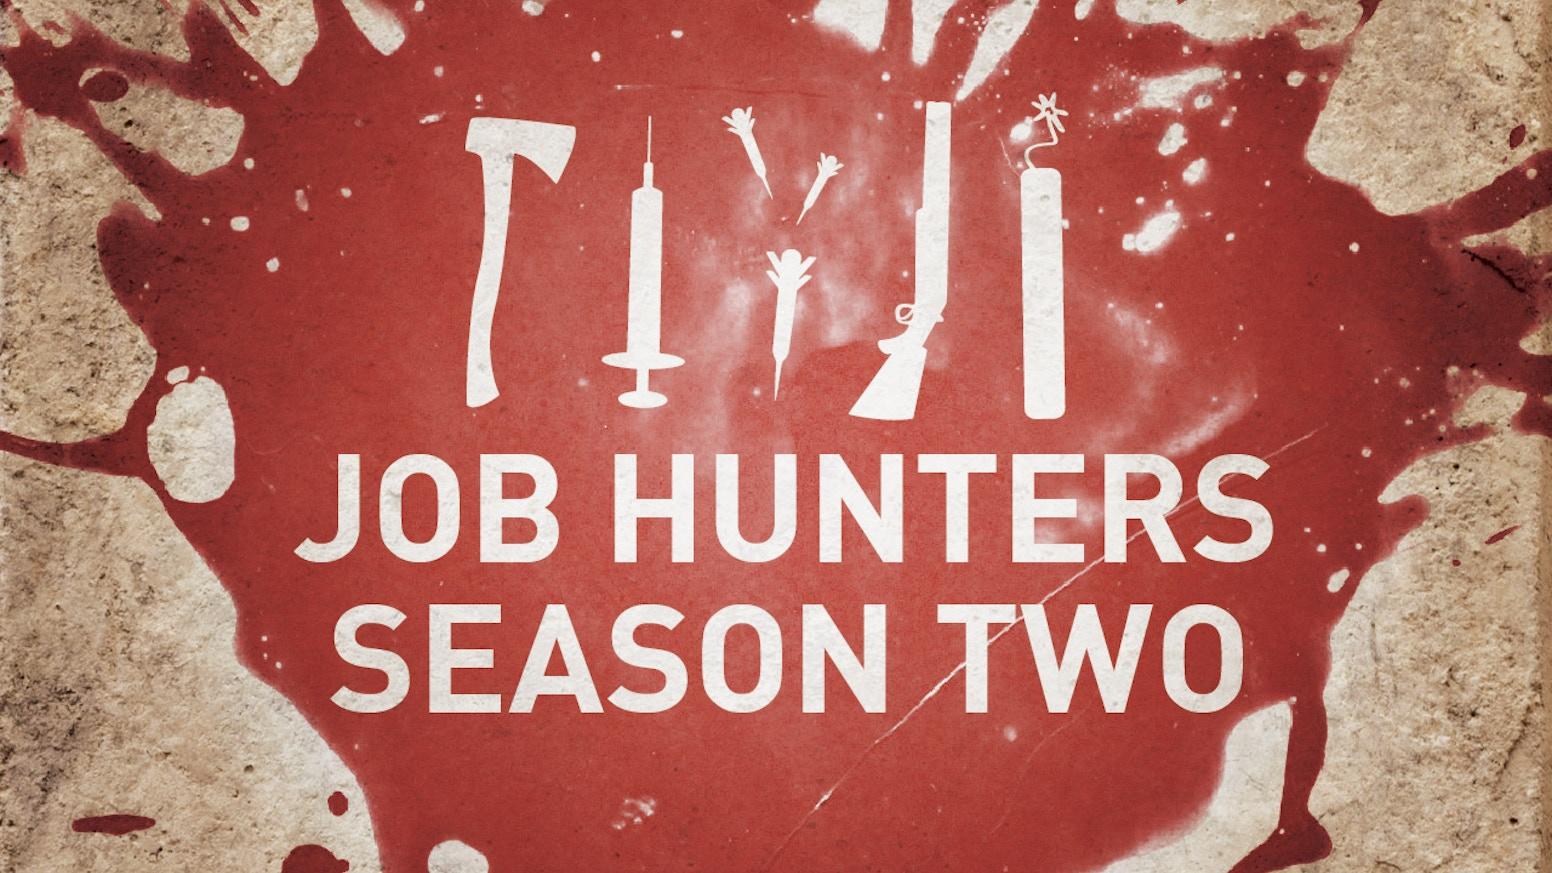 Job Hunters Season Two Web Series By Job Hunters Happy Anniversary Job Hunters Kickstarter